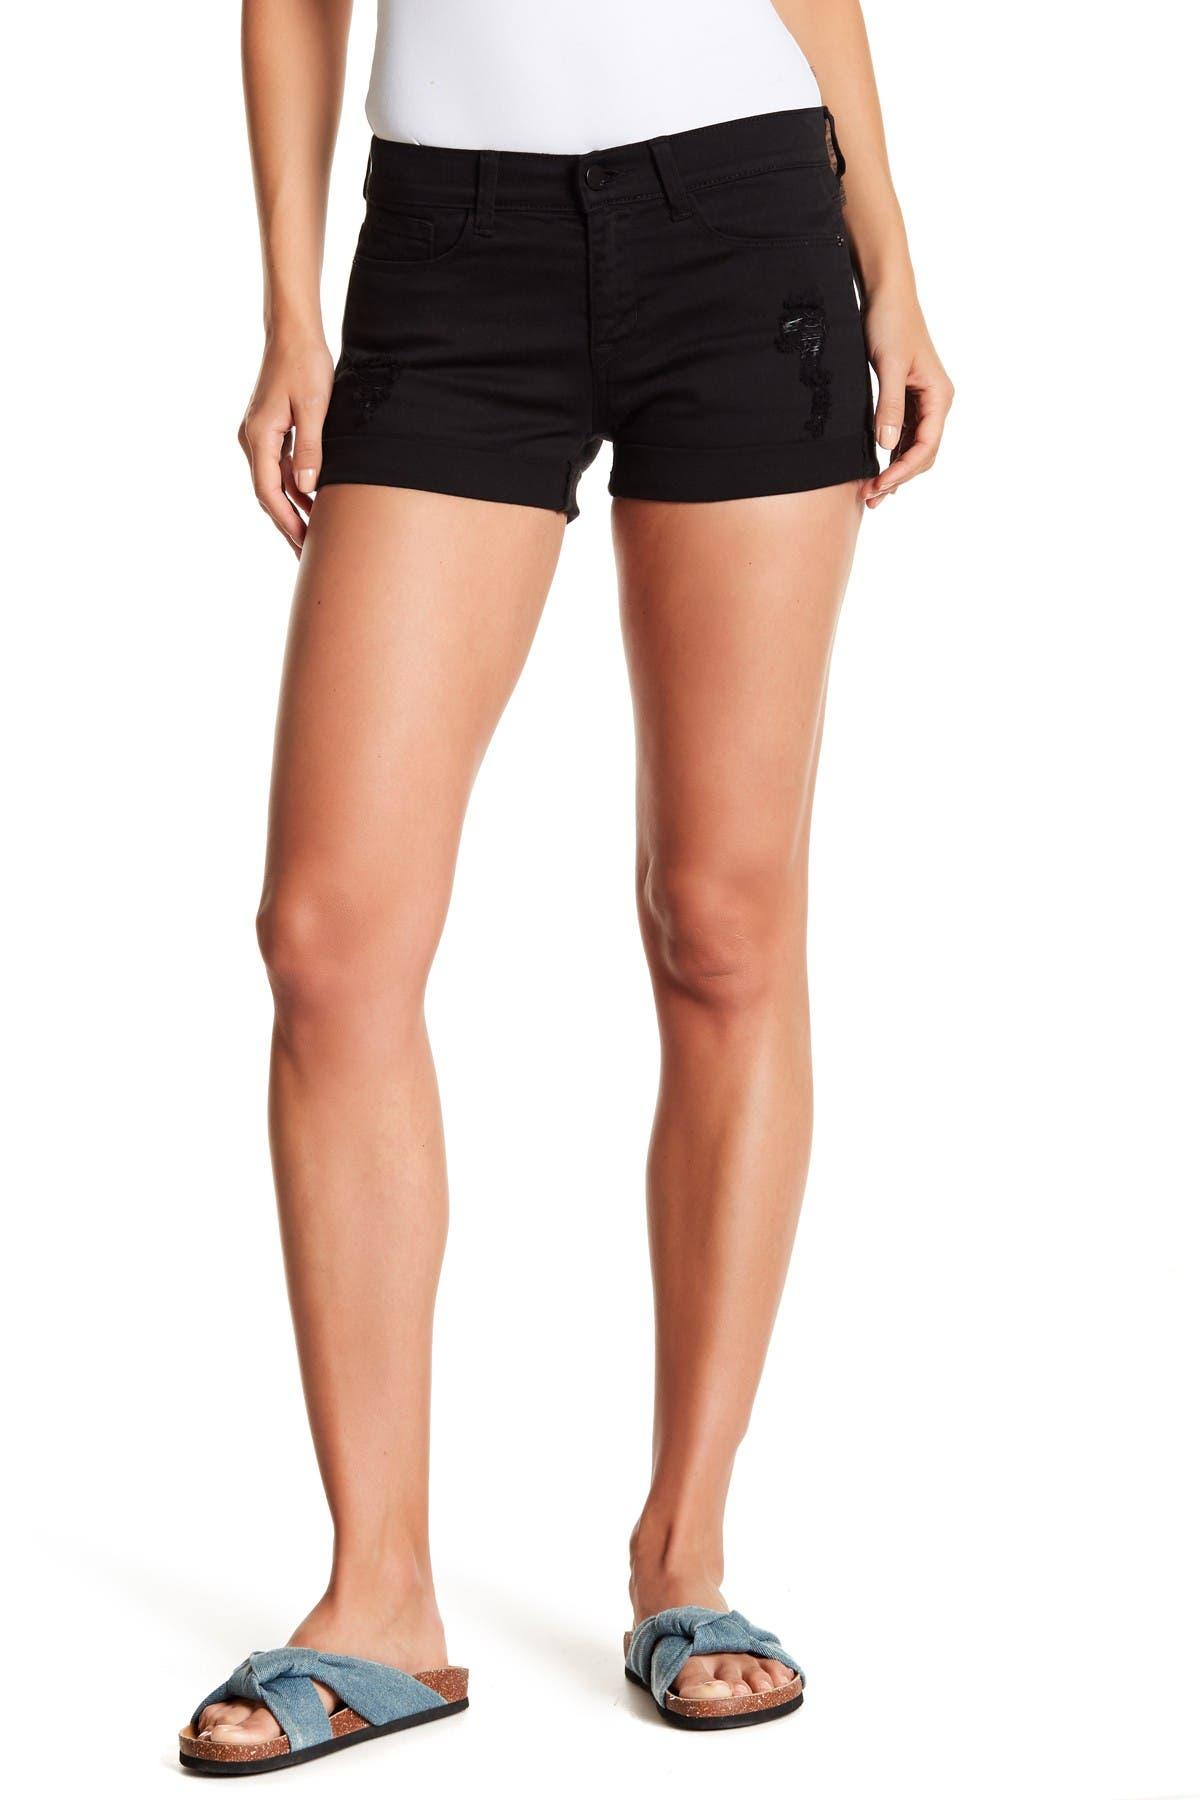 Image of SP BLACK Rolled Cuff Boyfriends Shorts